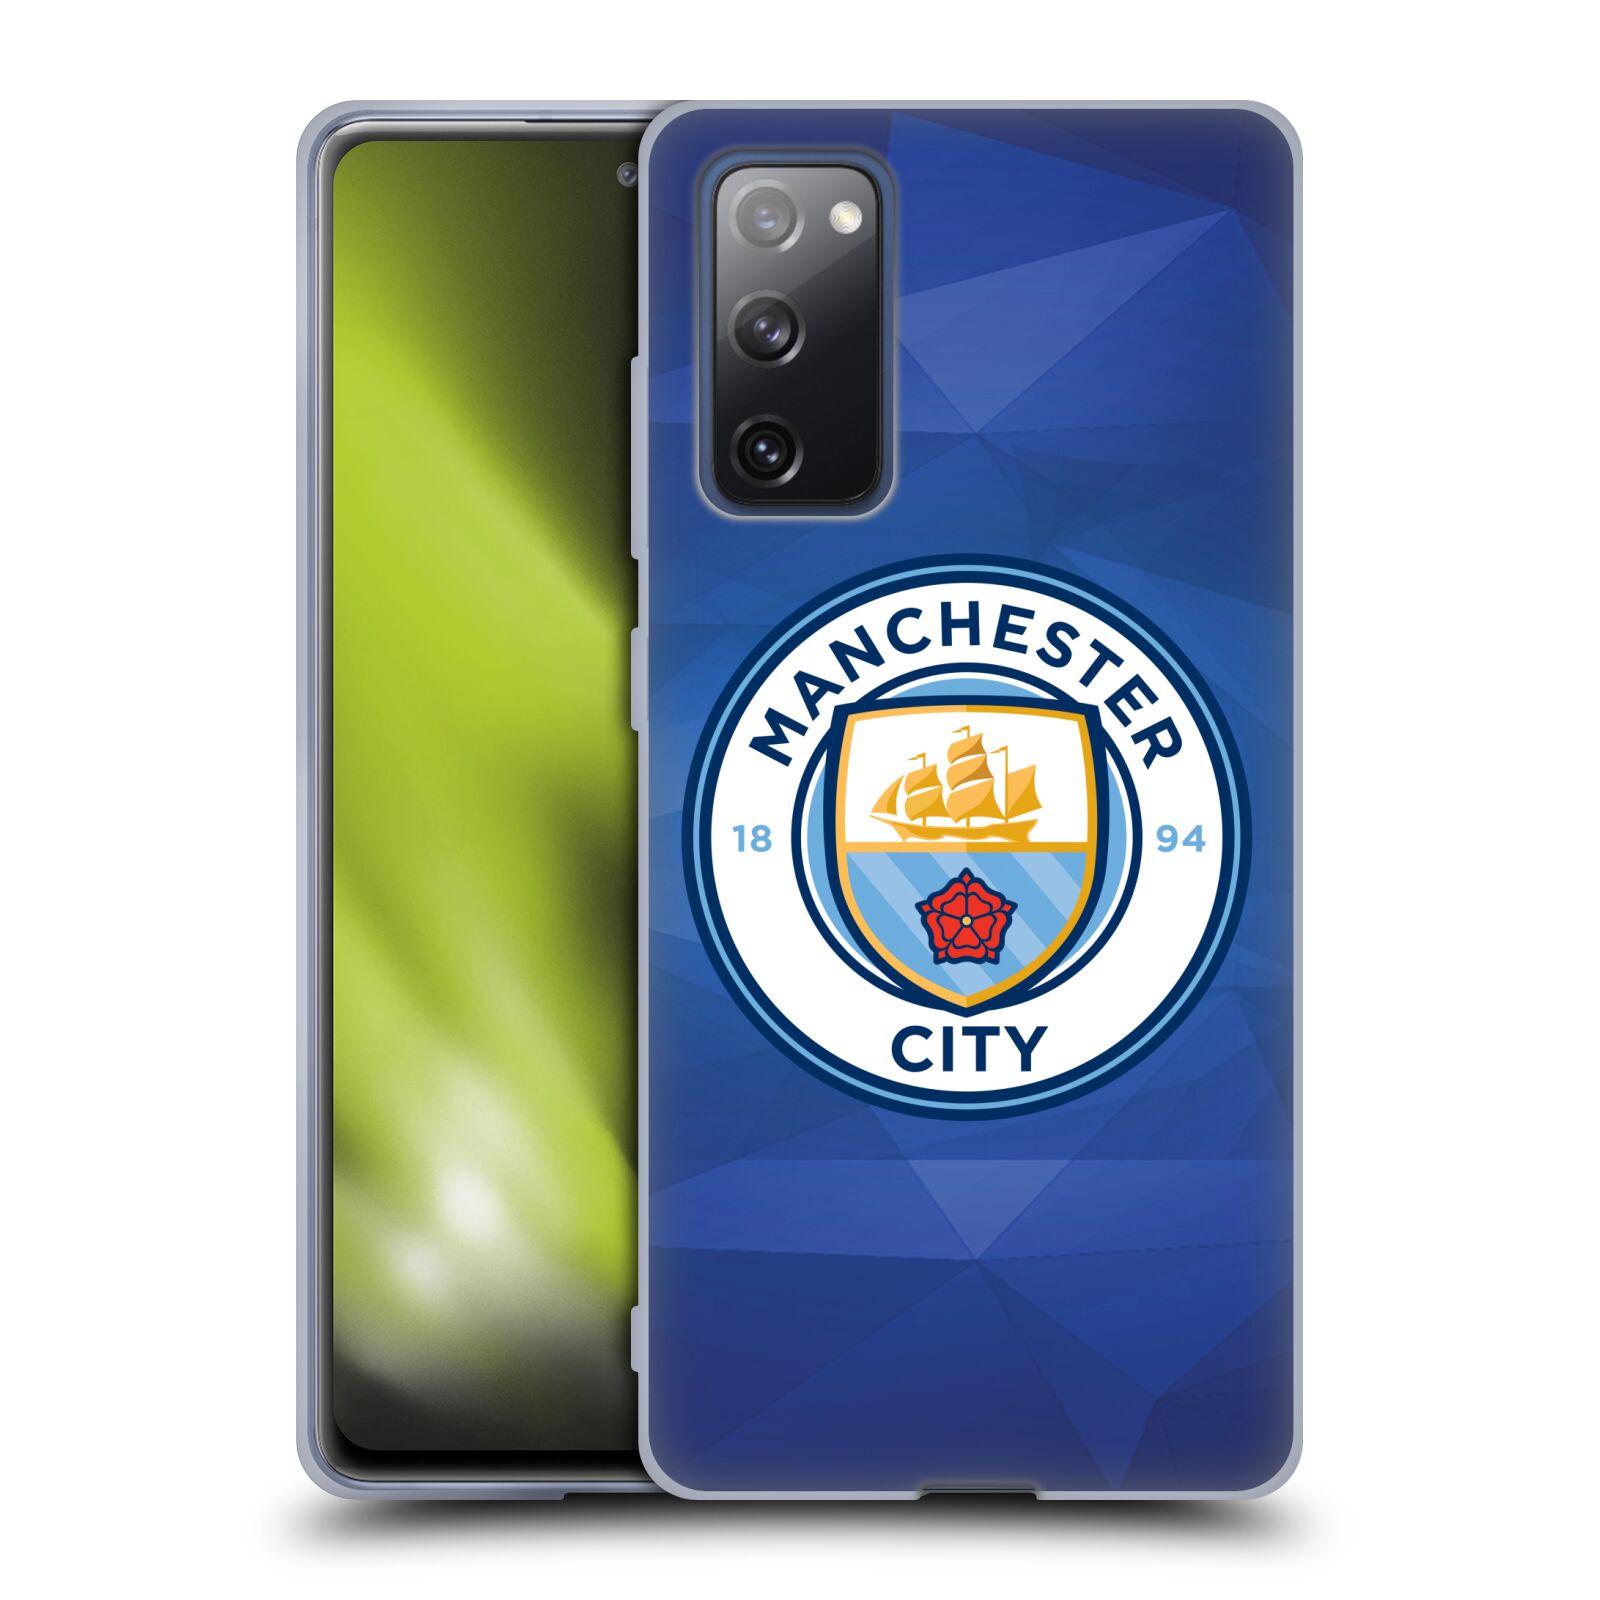 Silikonové pouzdro na mobil Samsung Galaxy S20 FE - Head Case - Manchester City FC - Modré nové logo